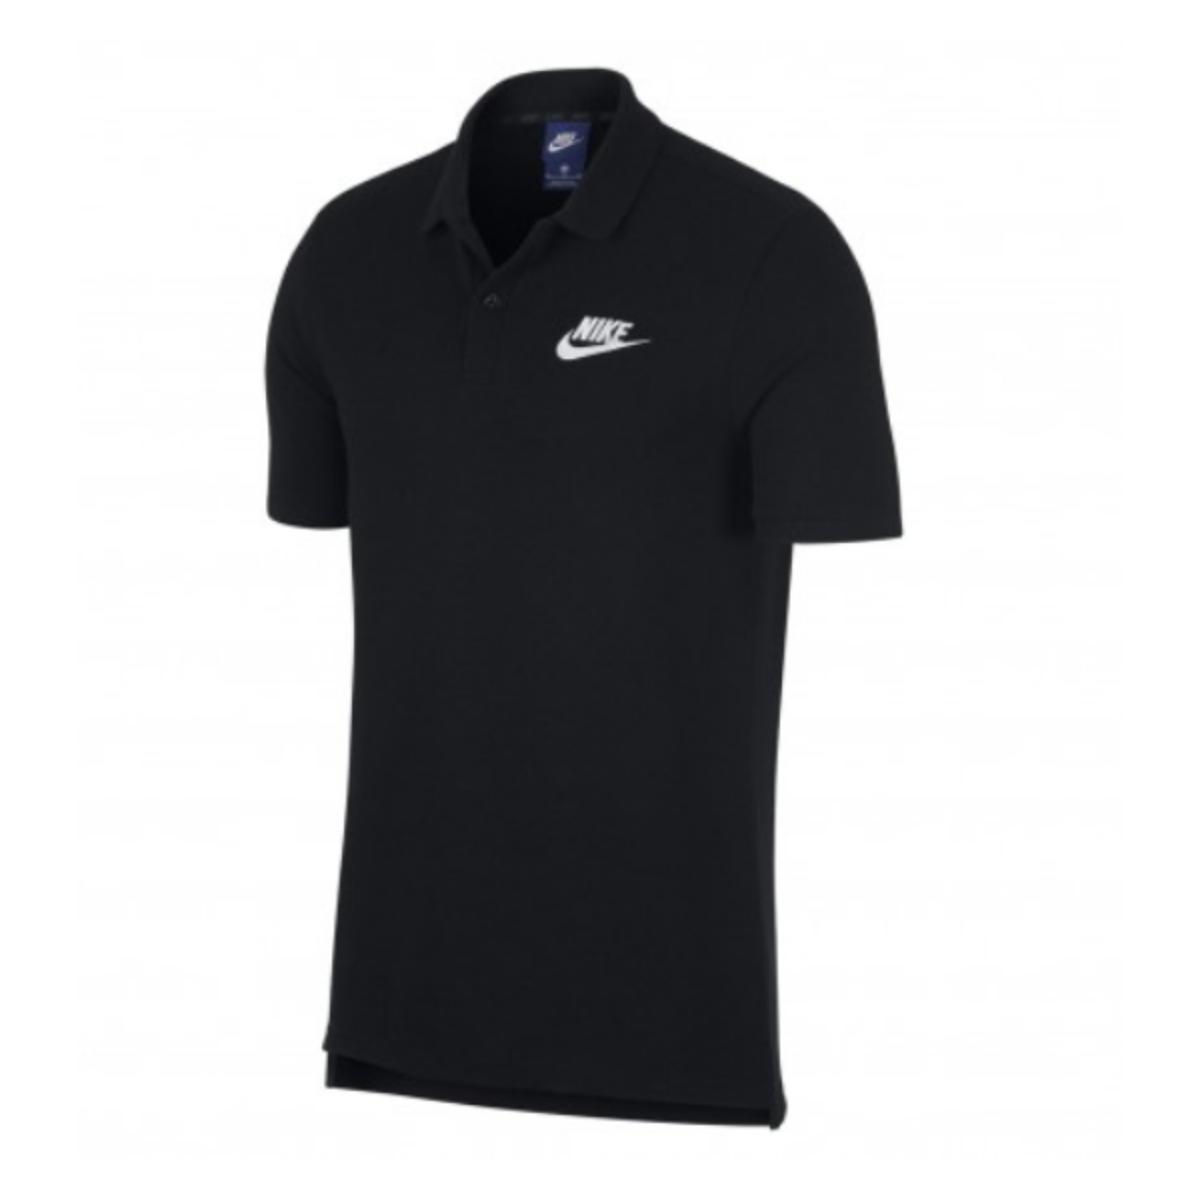 Camiseta Masculina Nike 909746-010 Sportswear Polo Preto